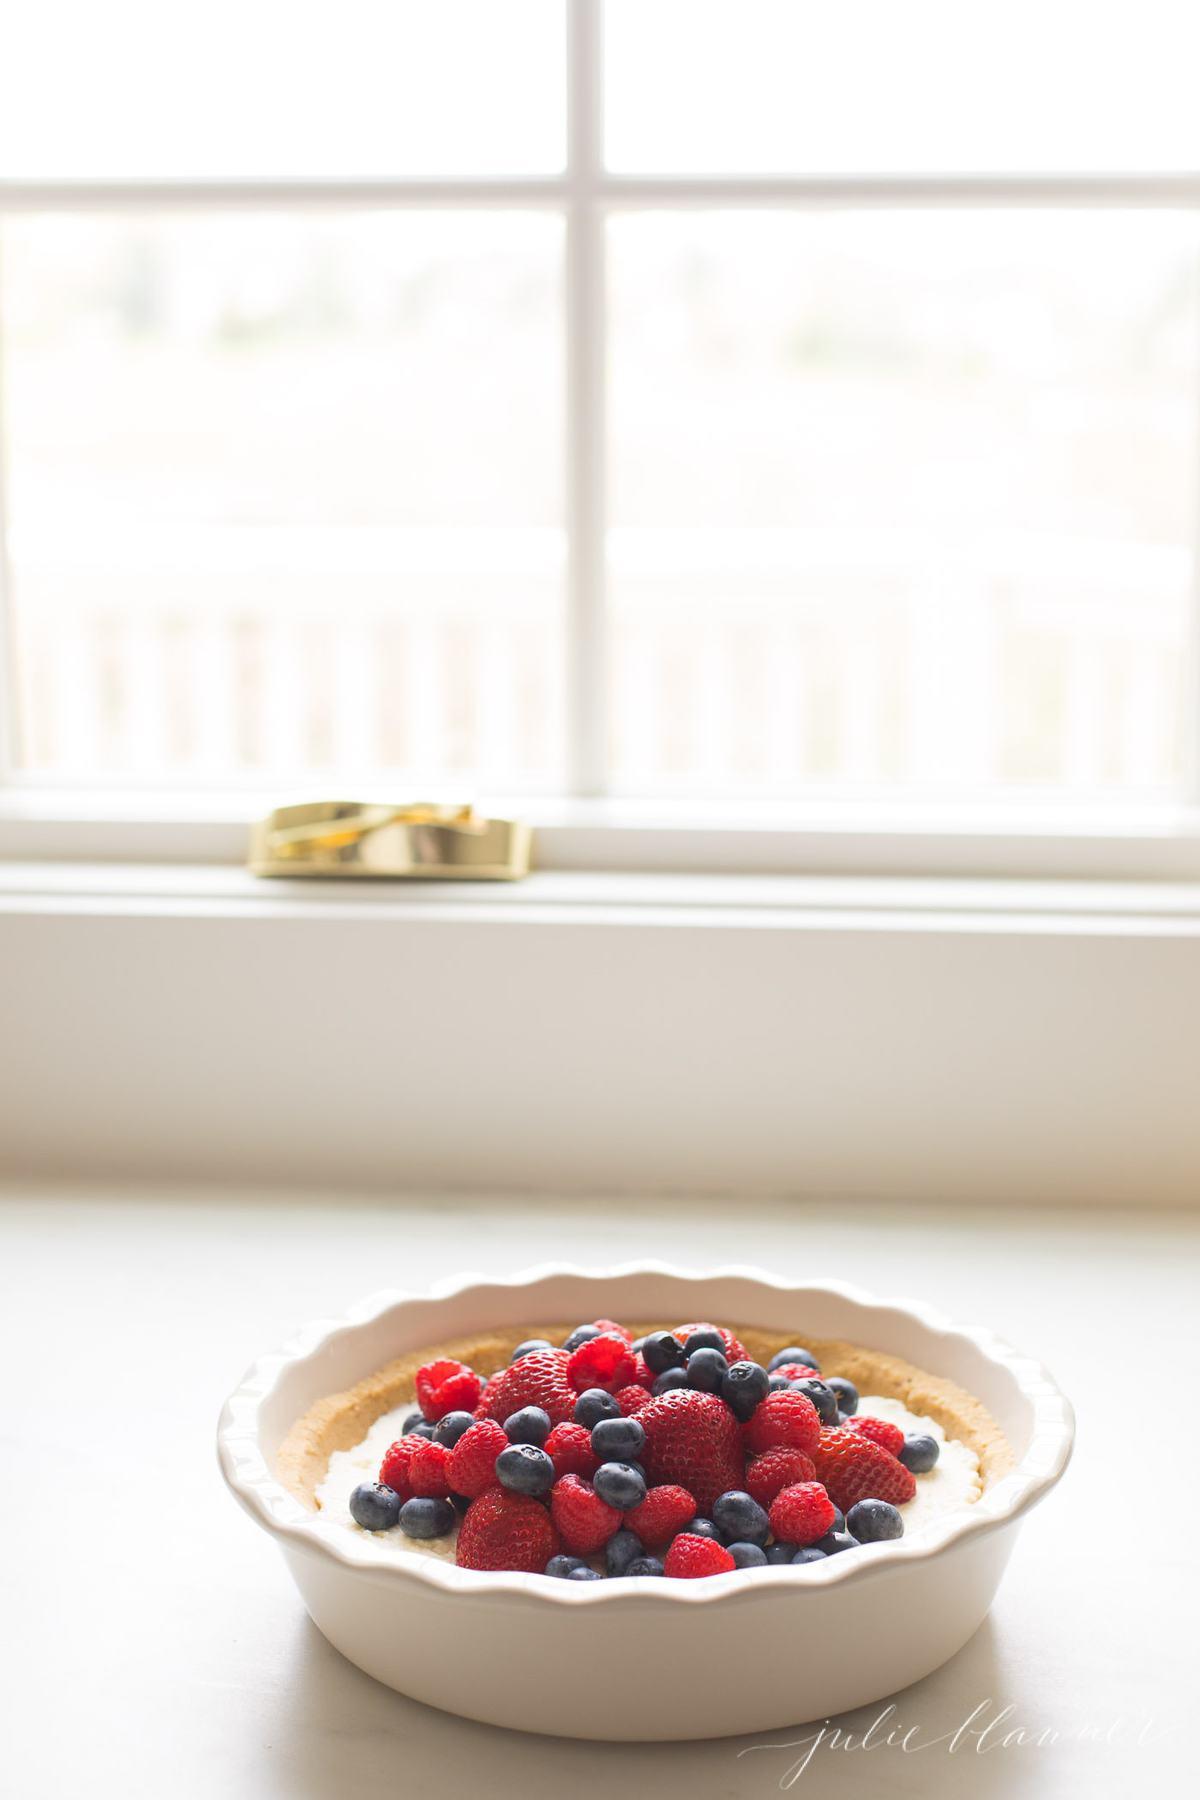 lemon pie with fruit sitting by window